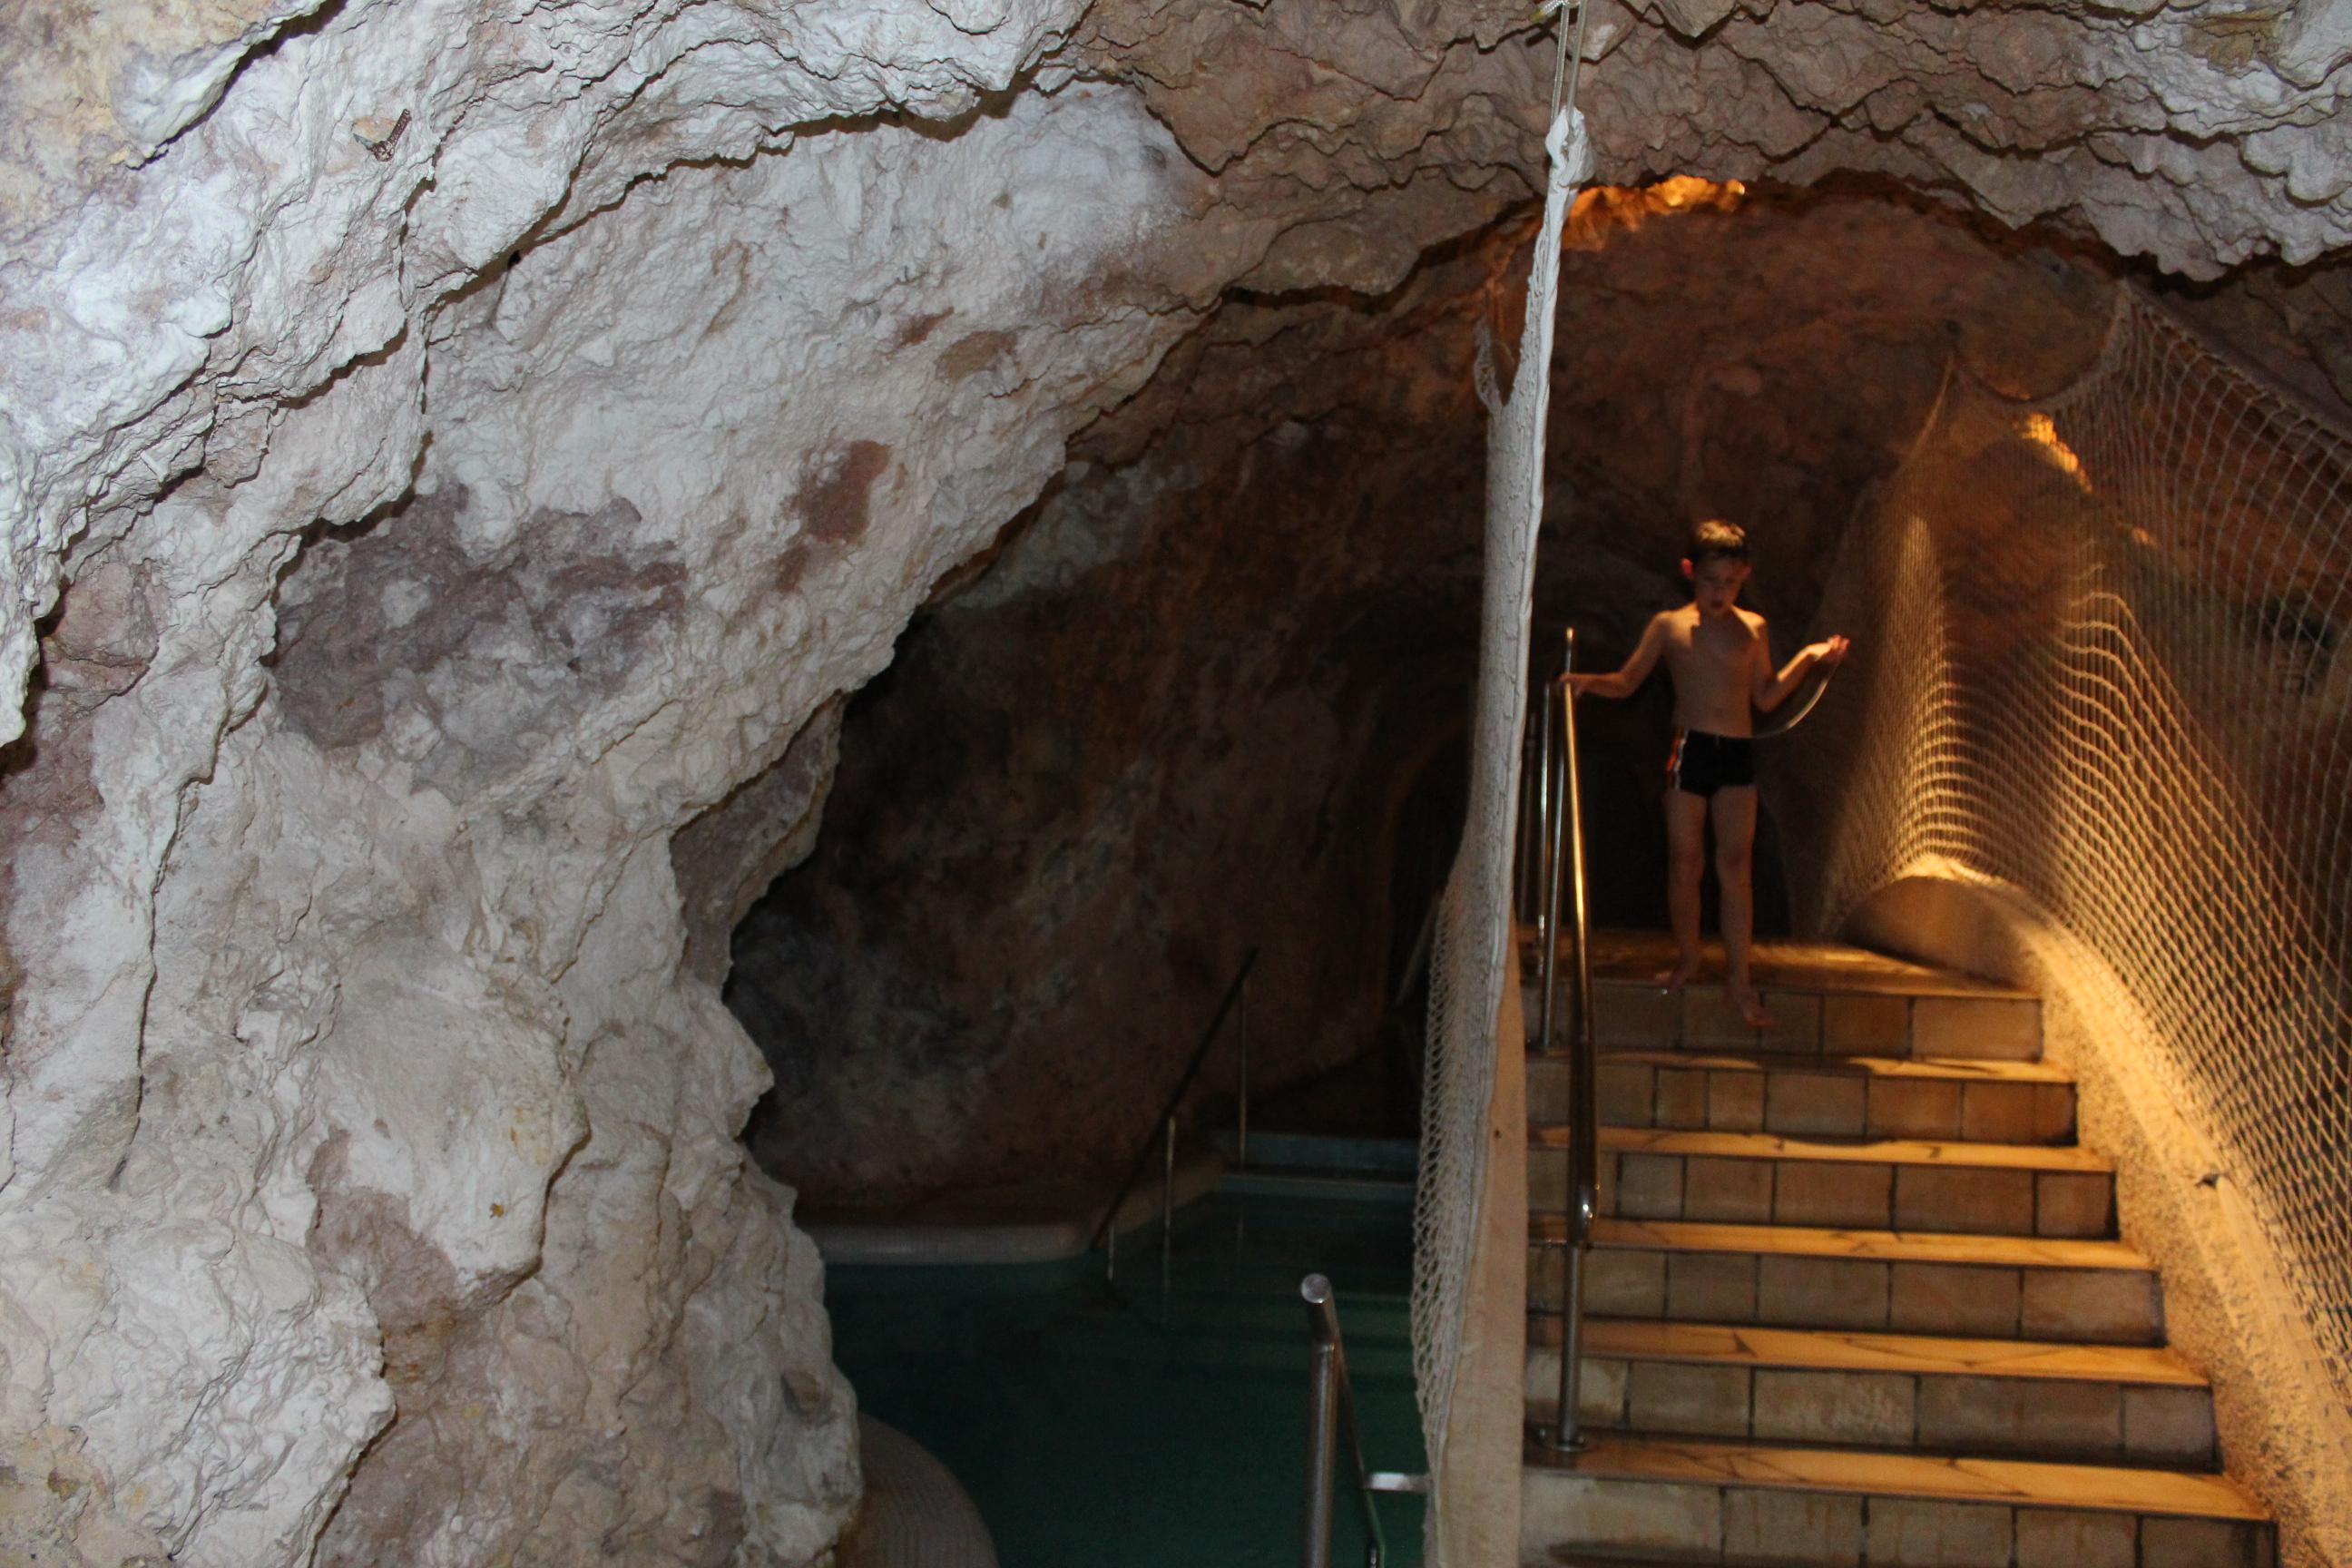 barlangfurdo2014-nyar_kcs_63.JPG